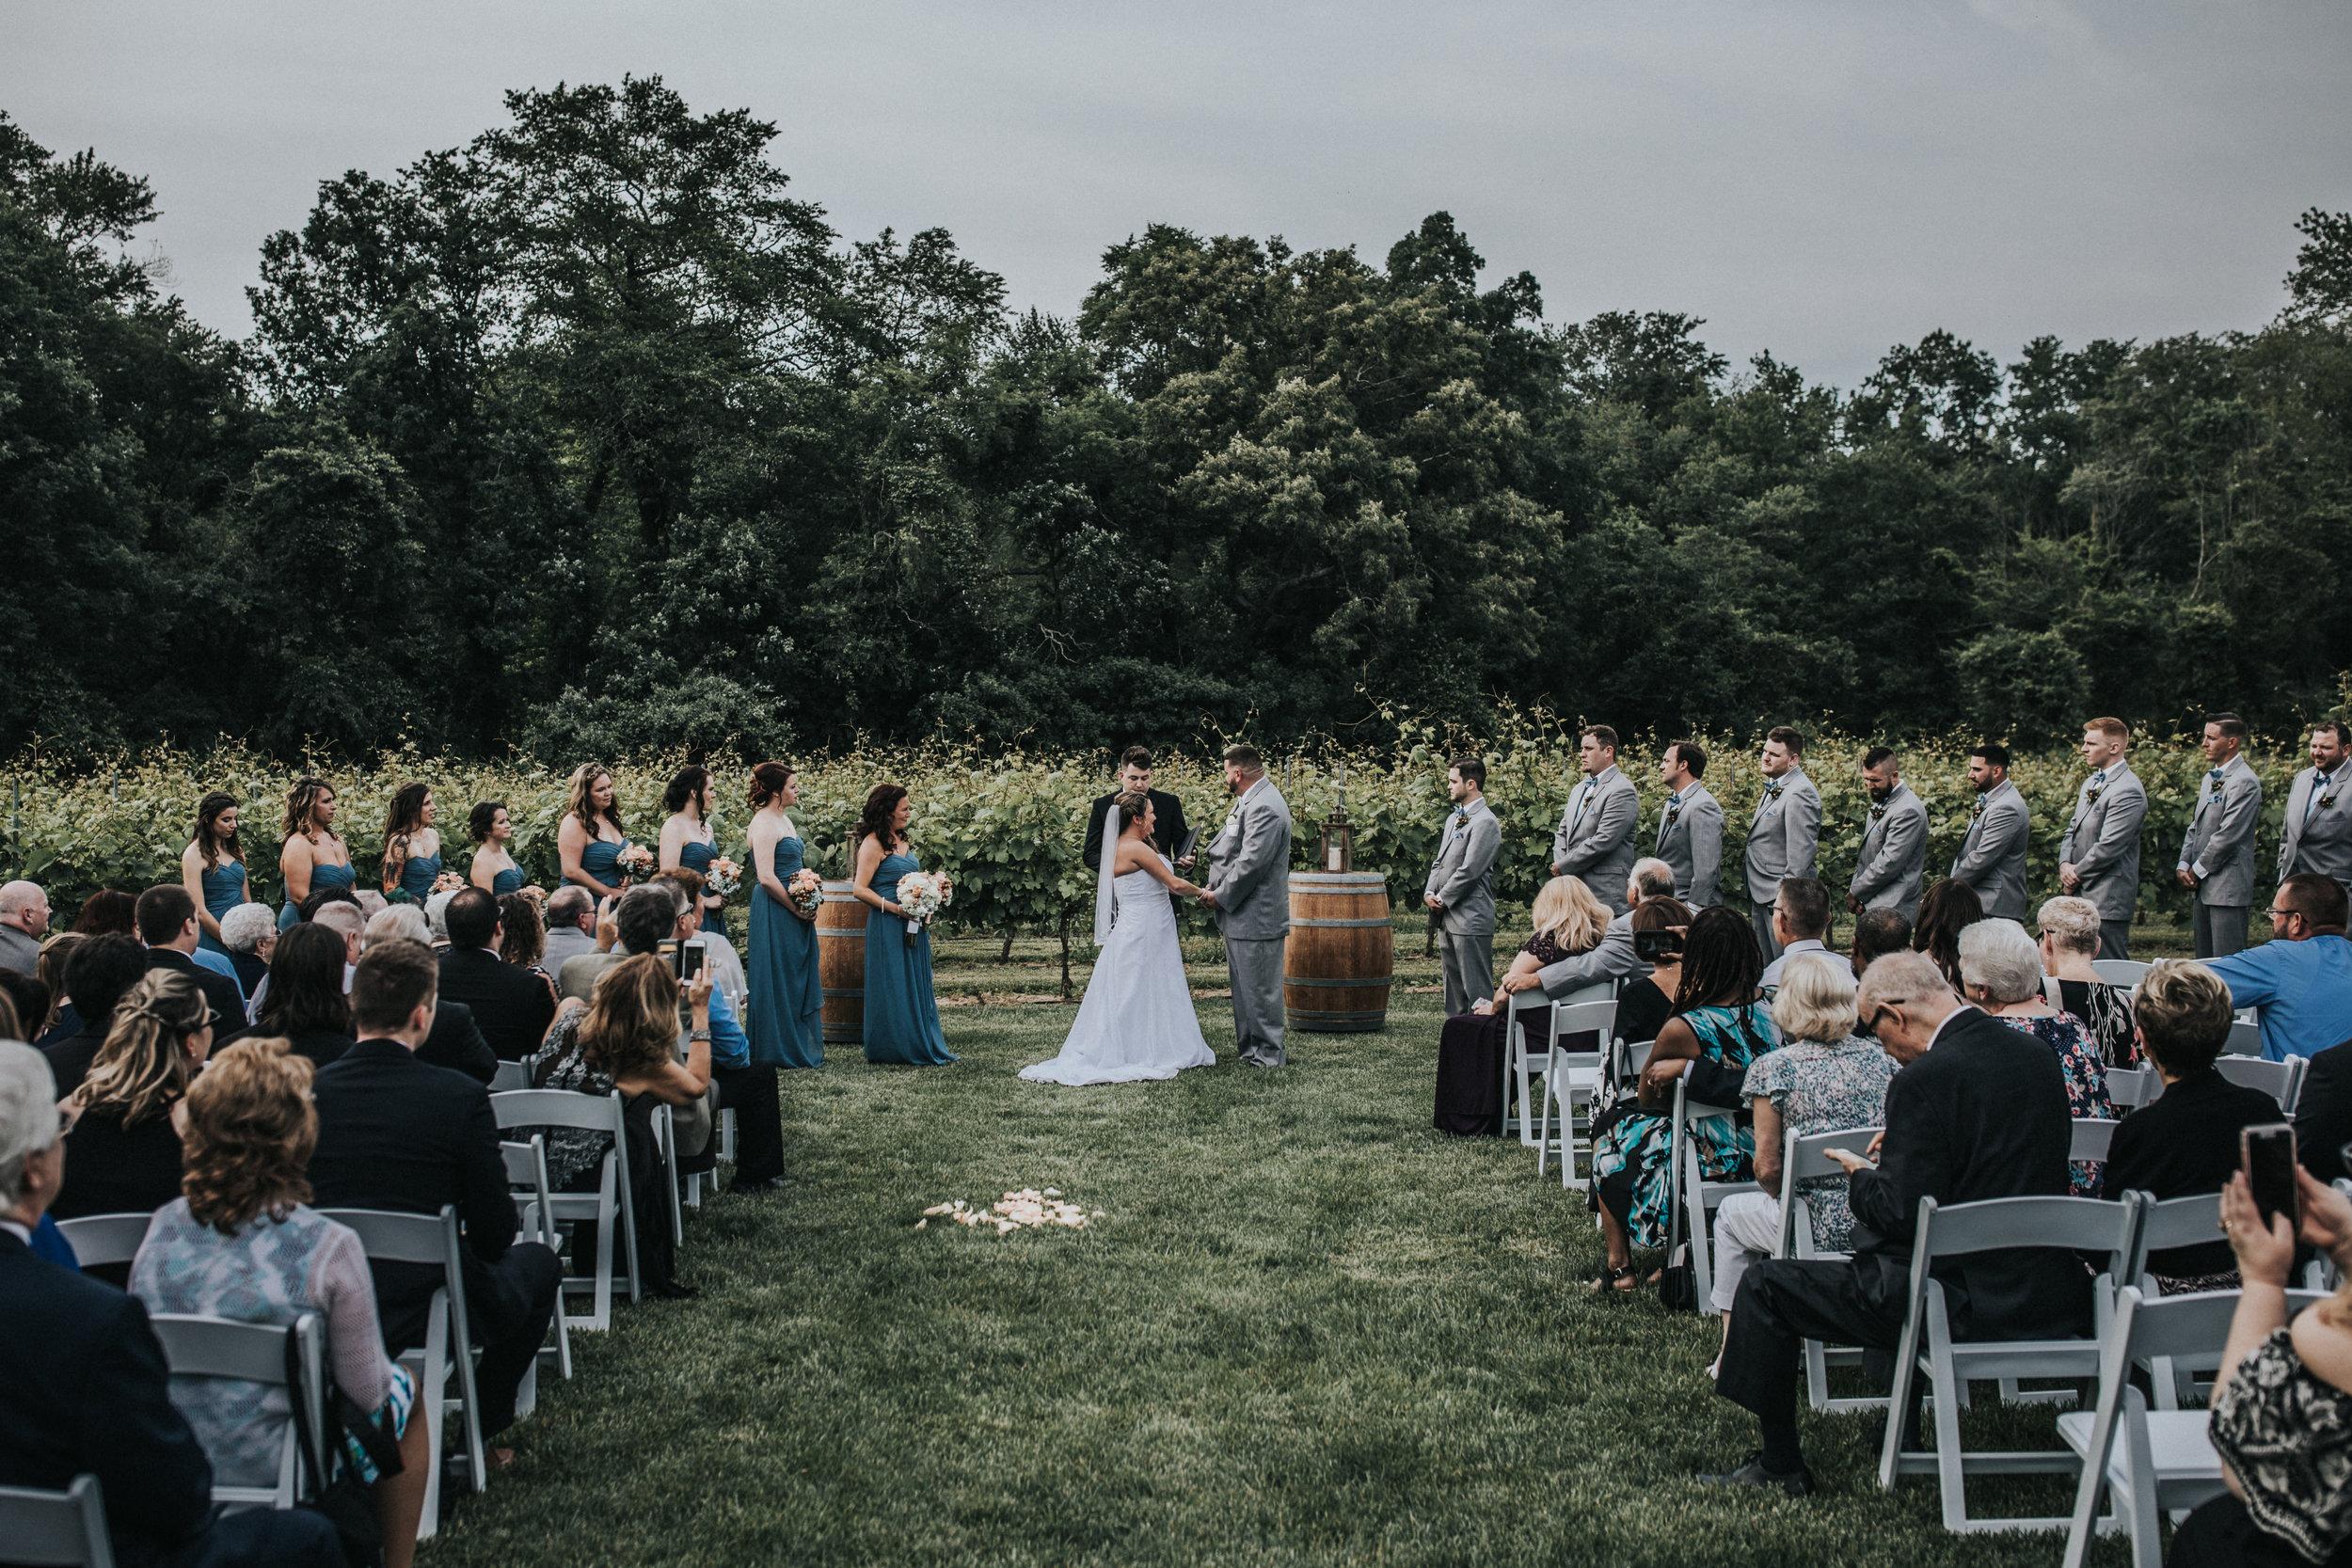 New-Jersey-Wedding-Photographer-JennaLynnPhotography-ValenzanoWinery-Ceremony-47.jpg